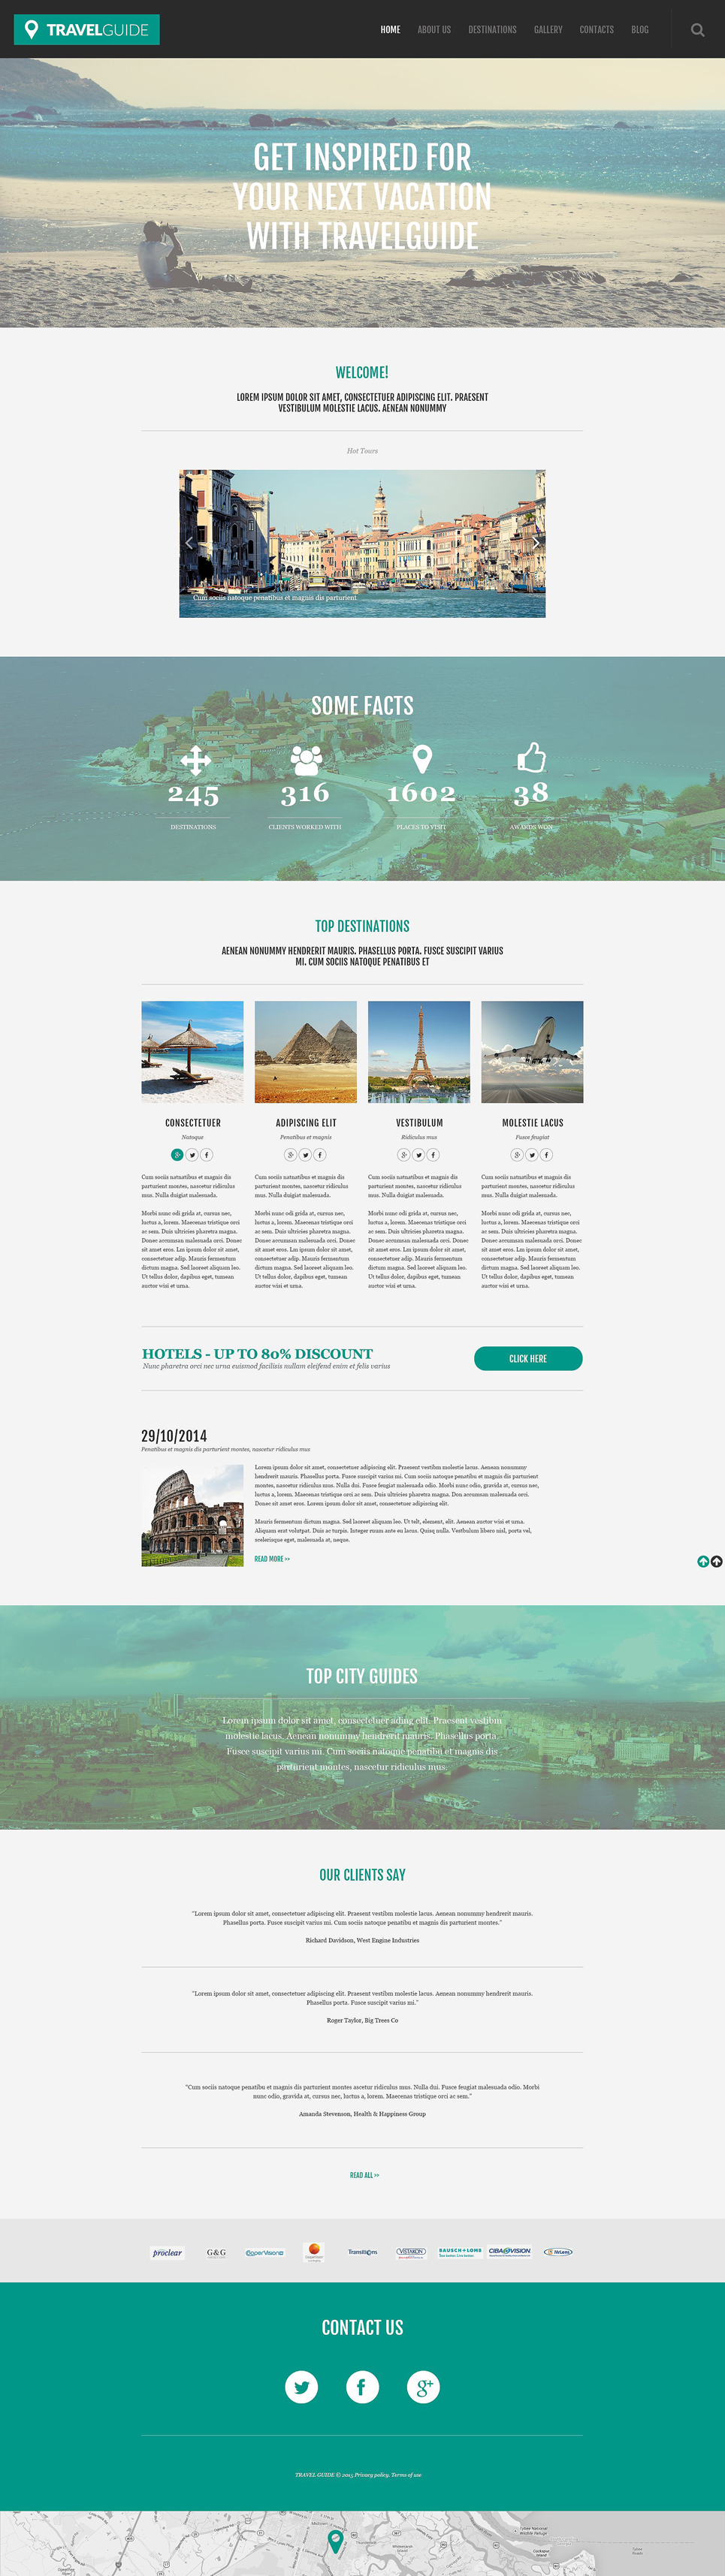 Адаптивный шаблон сайта на тему агентство путешествий #55031